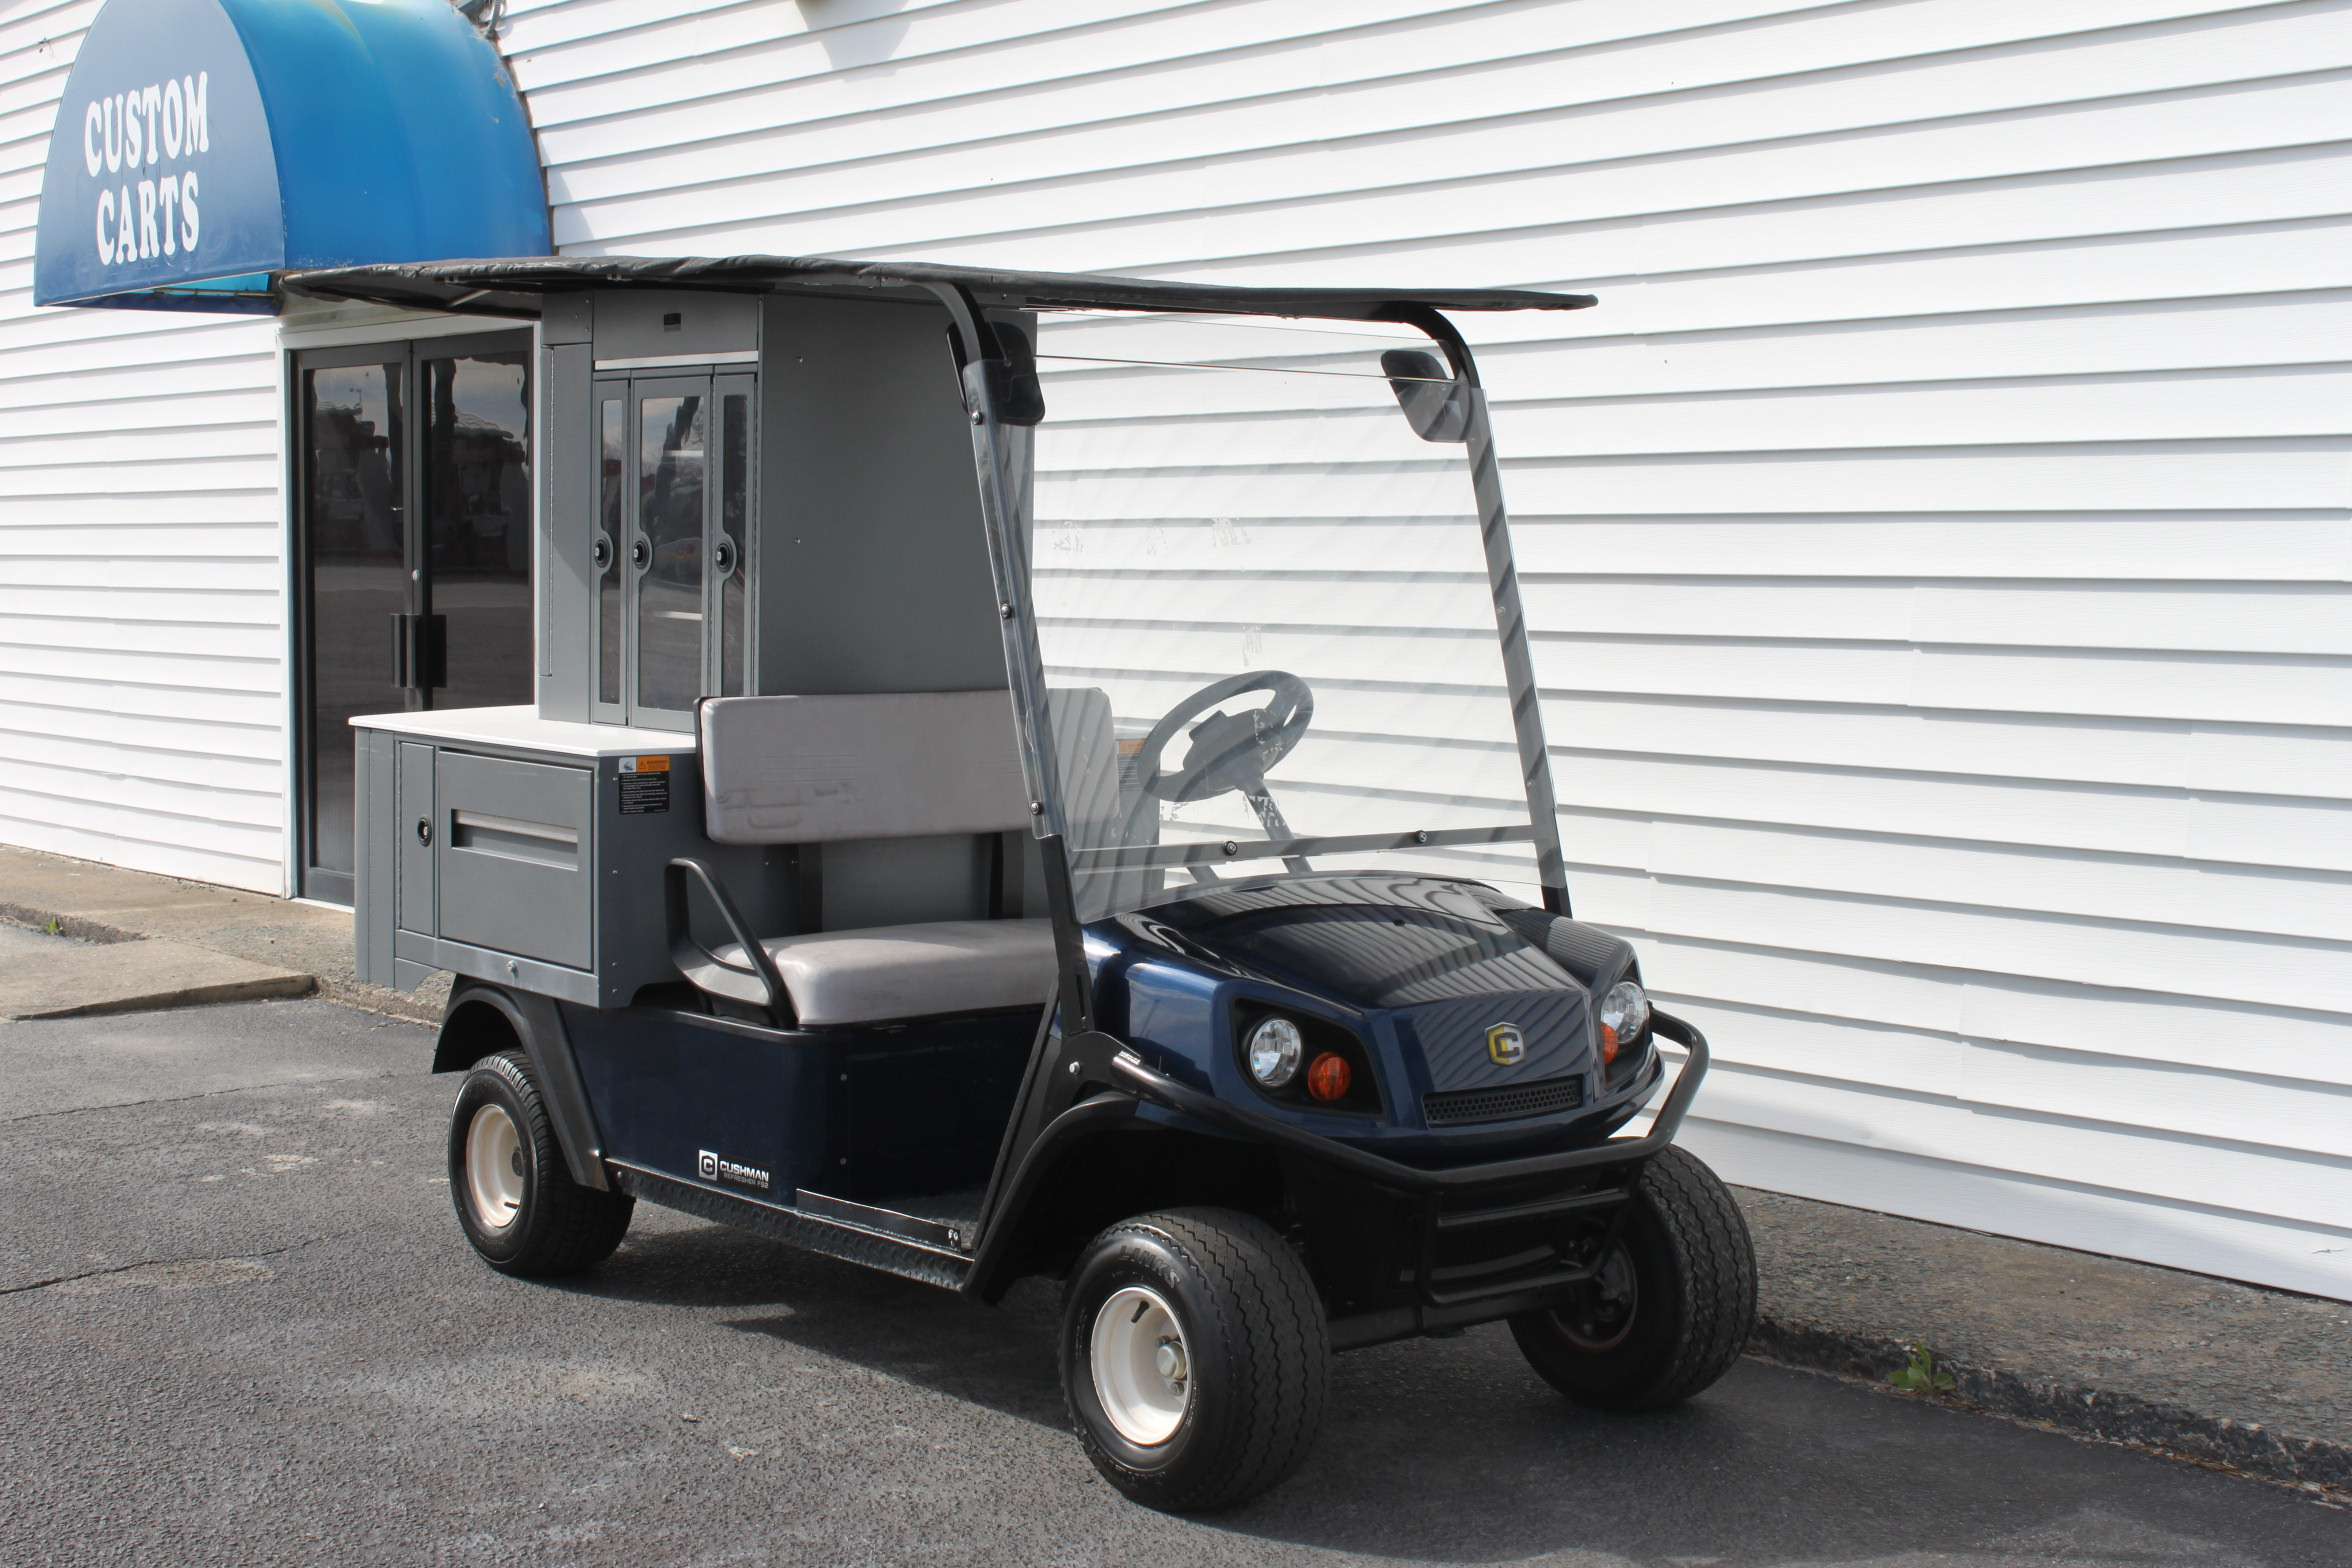 hdk golf cart manual wiring diagrams